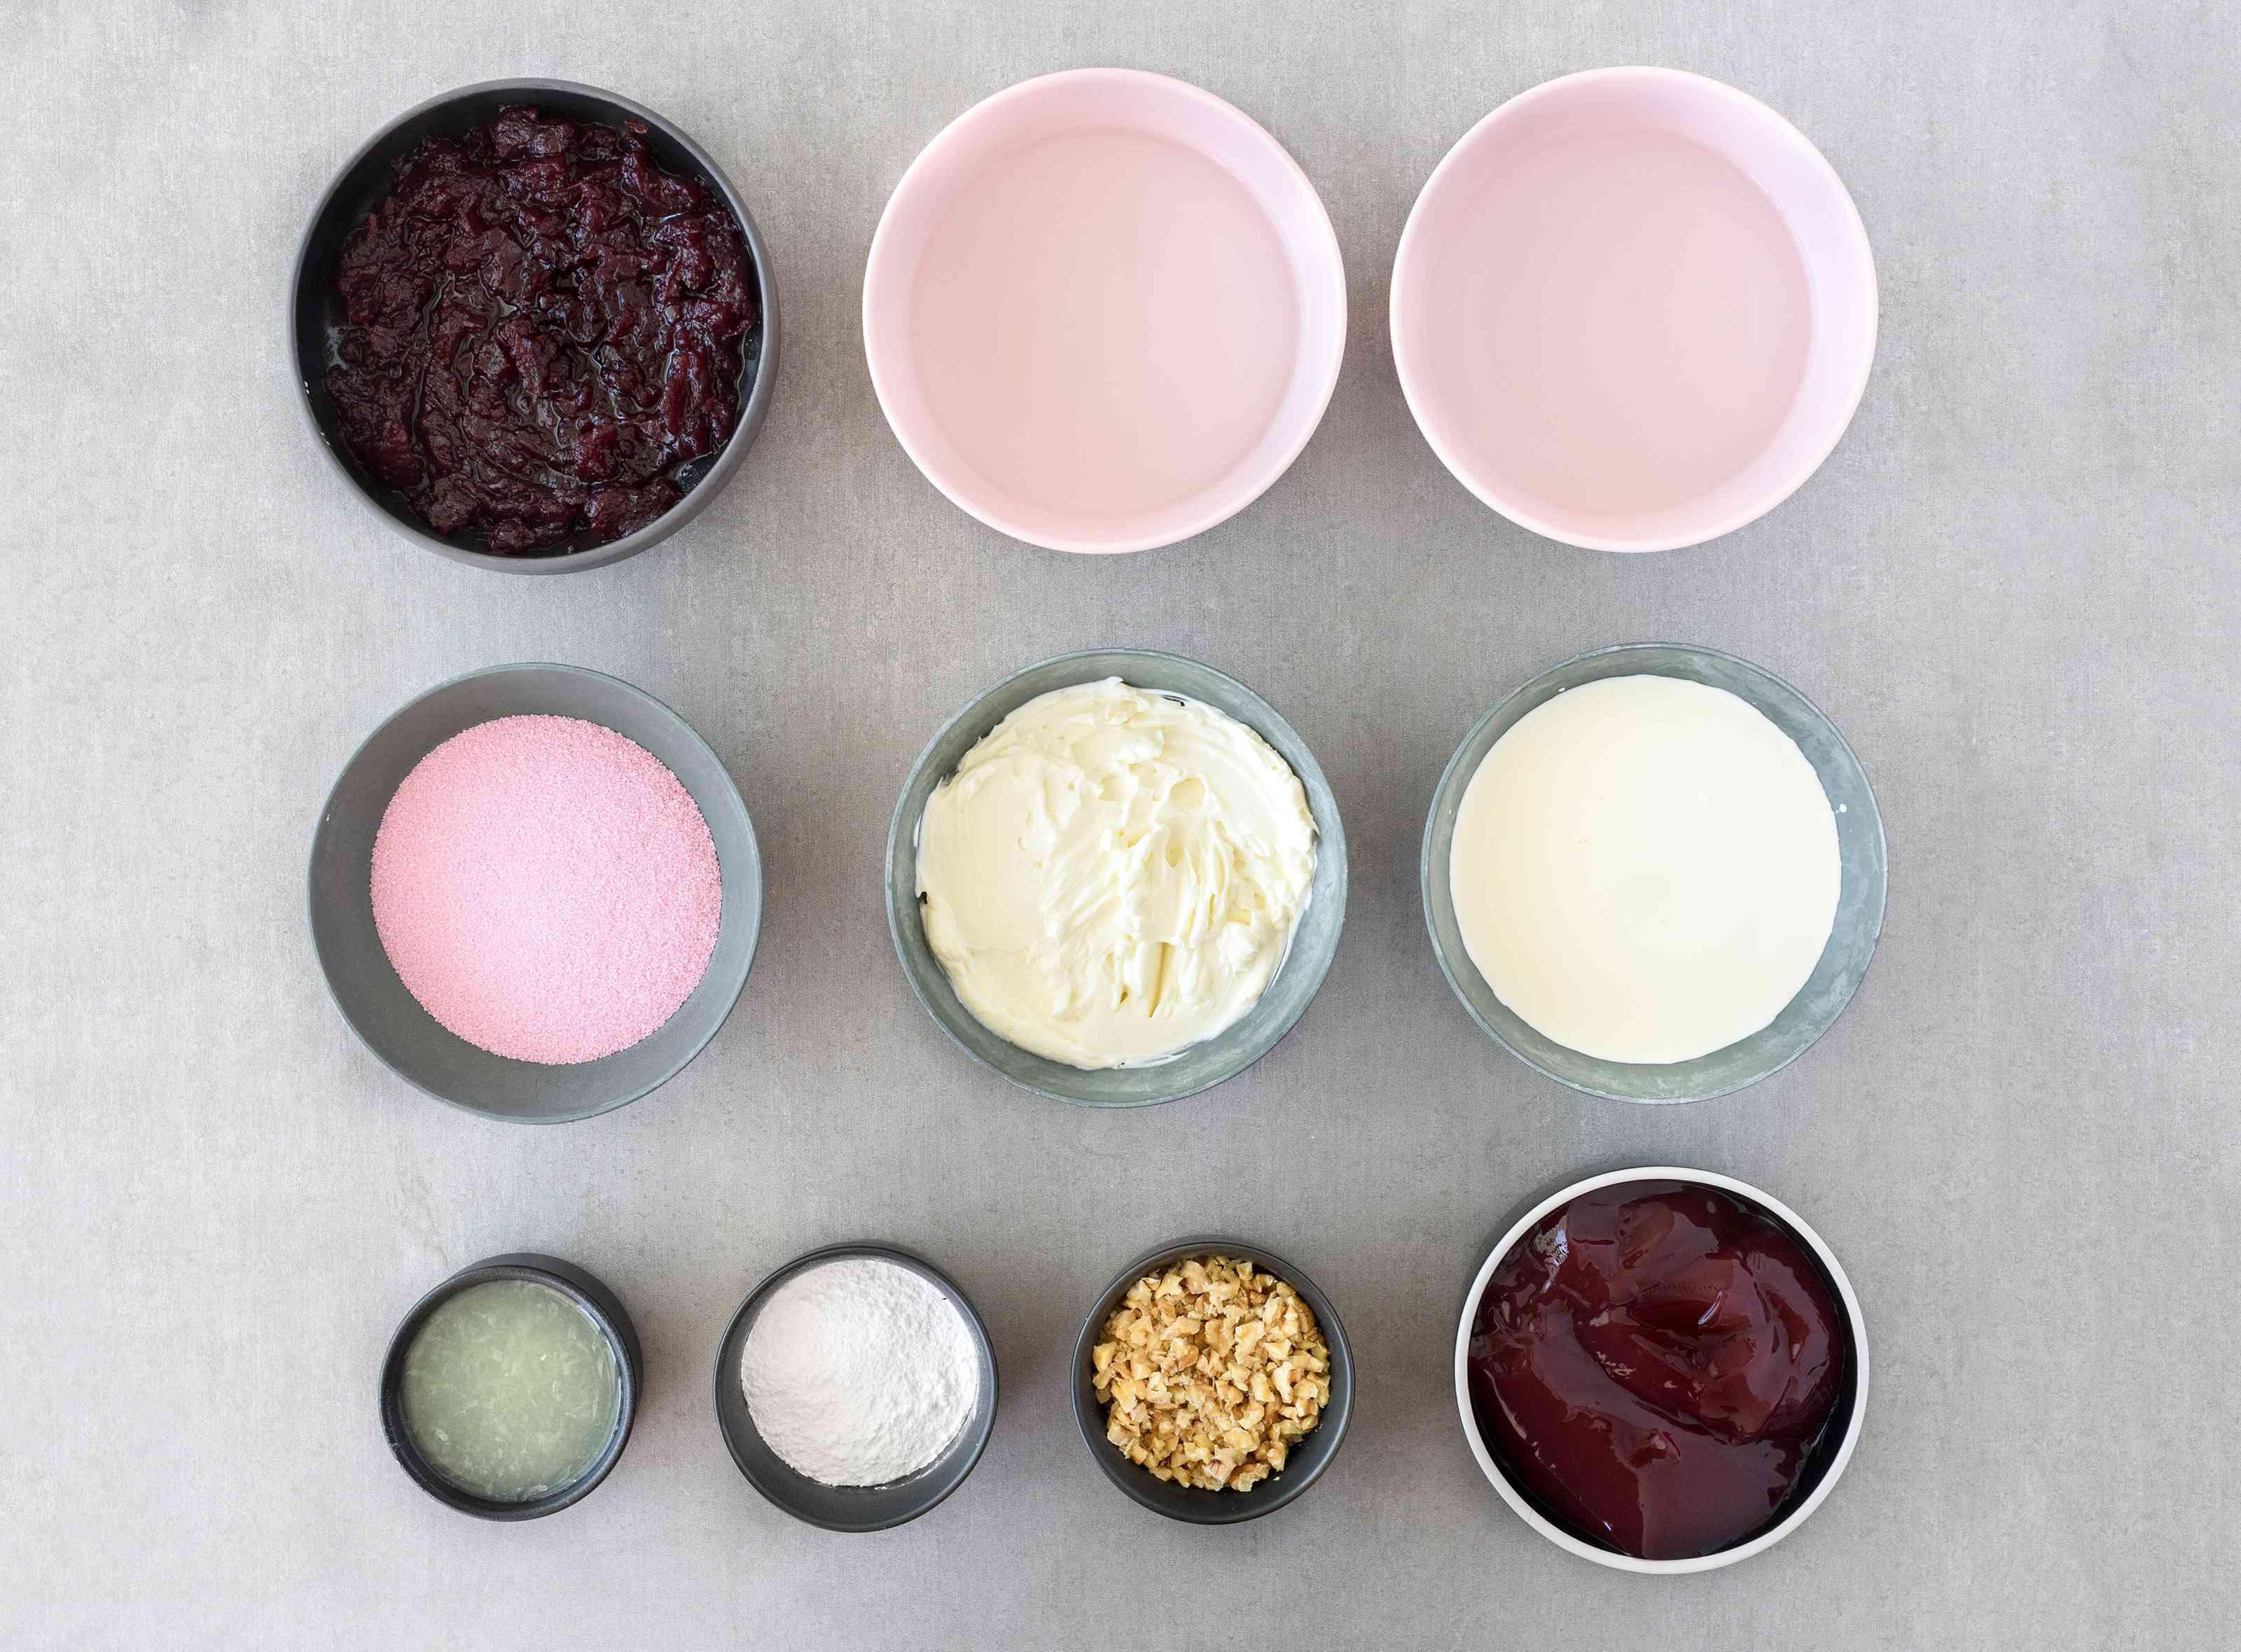 Ingredients for cranberry gelatin salad